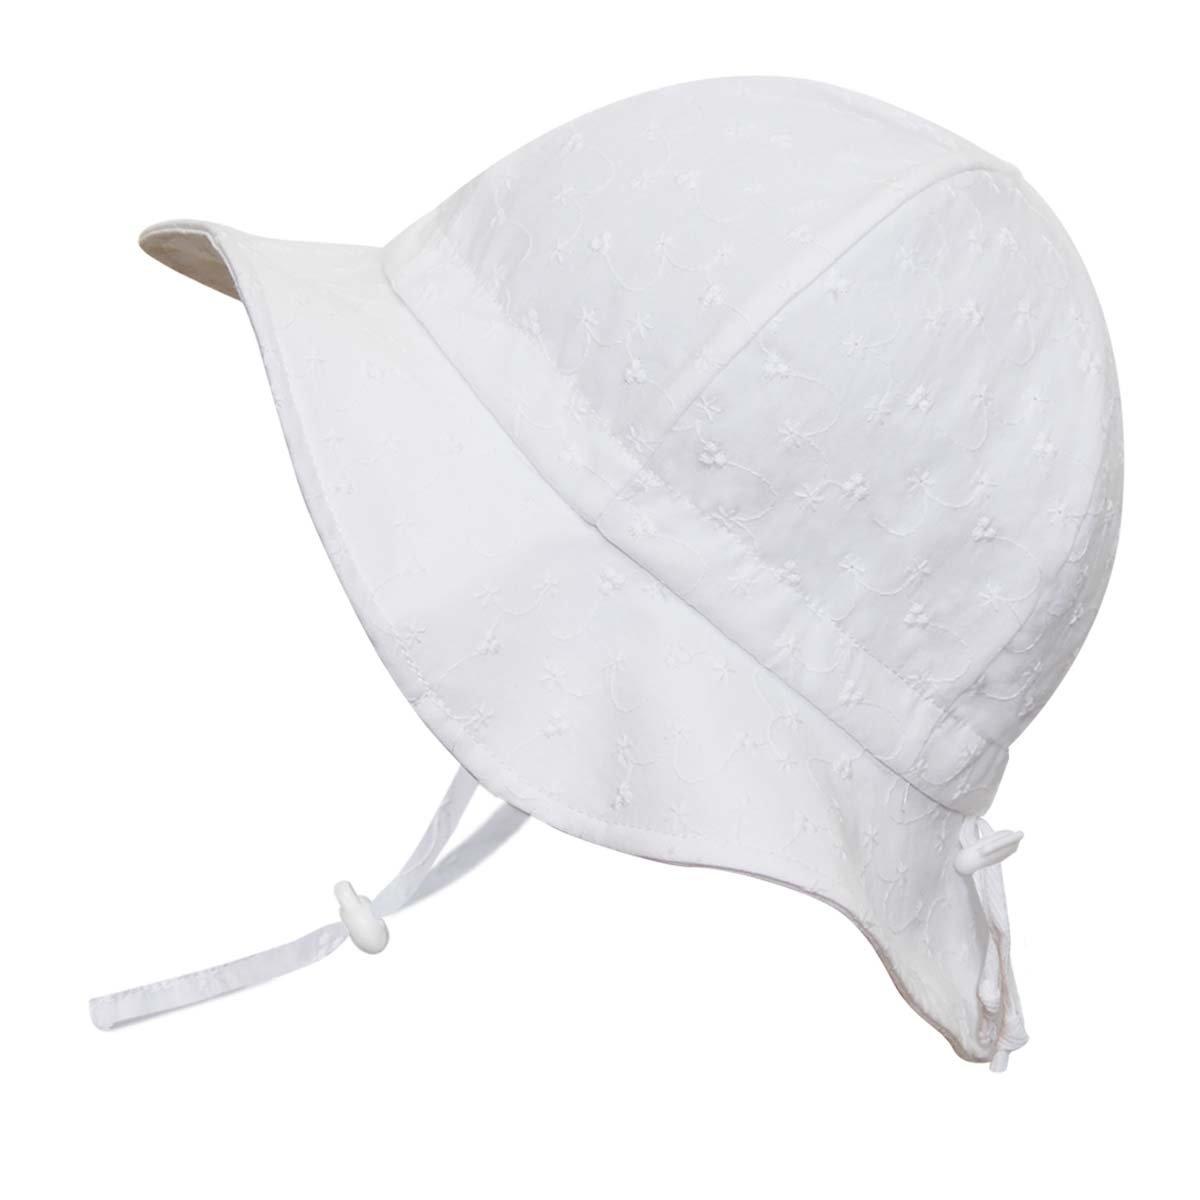 JAN & JUL Toddler Girls White Cotton Sun Hats 50 UPF, Drawstring Adjustable, Stay-on Tie (M: 6-24m, Floppy Hat: Tiny Eyelet - Toggled Chinstrap)